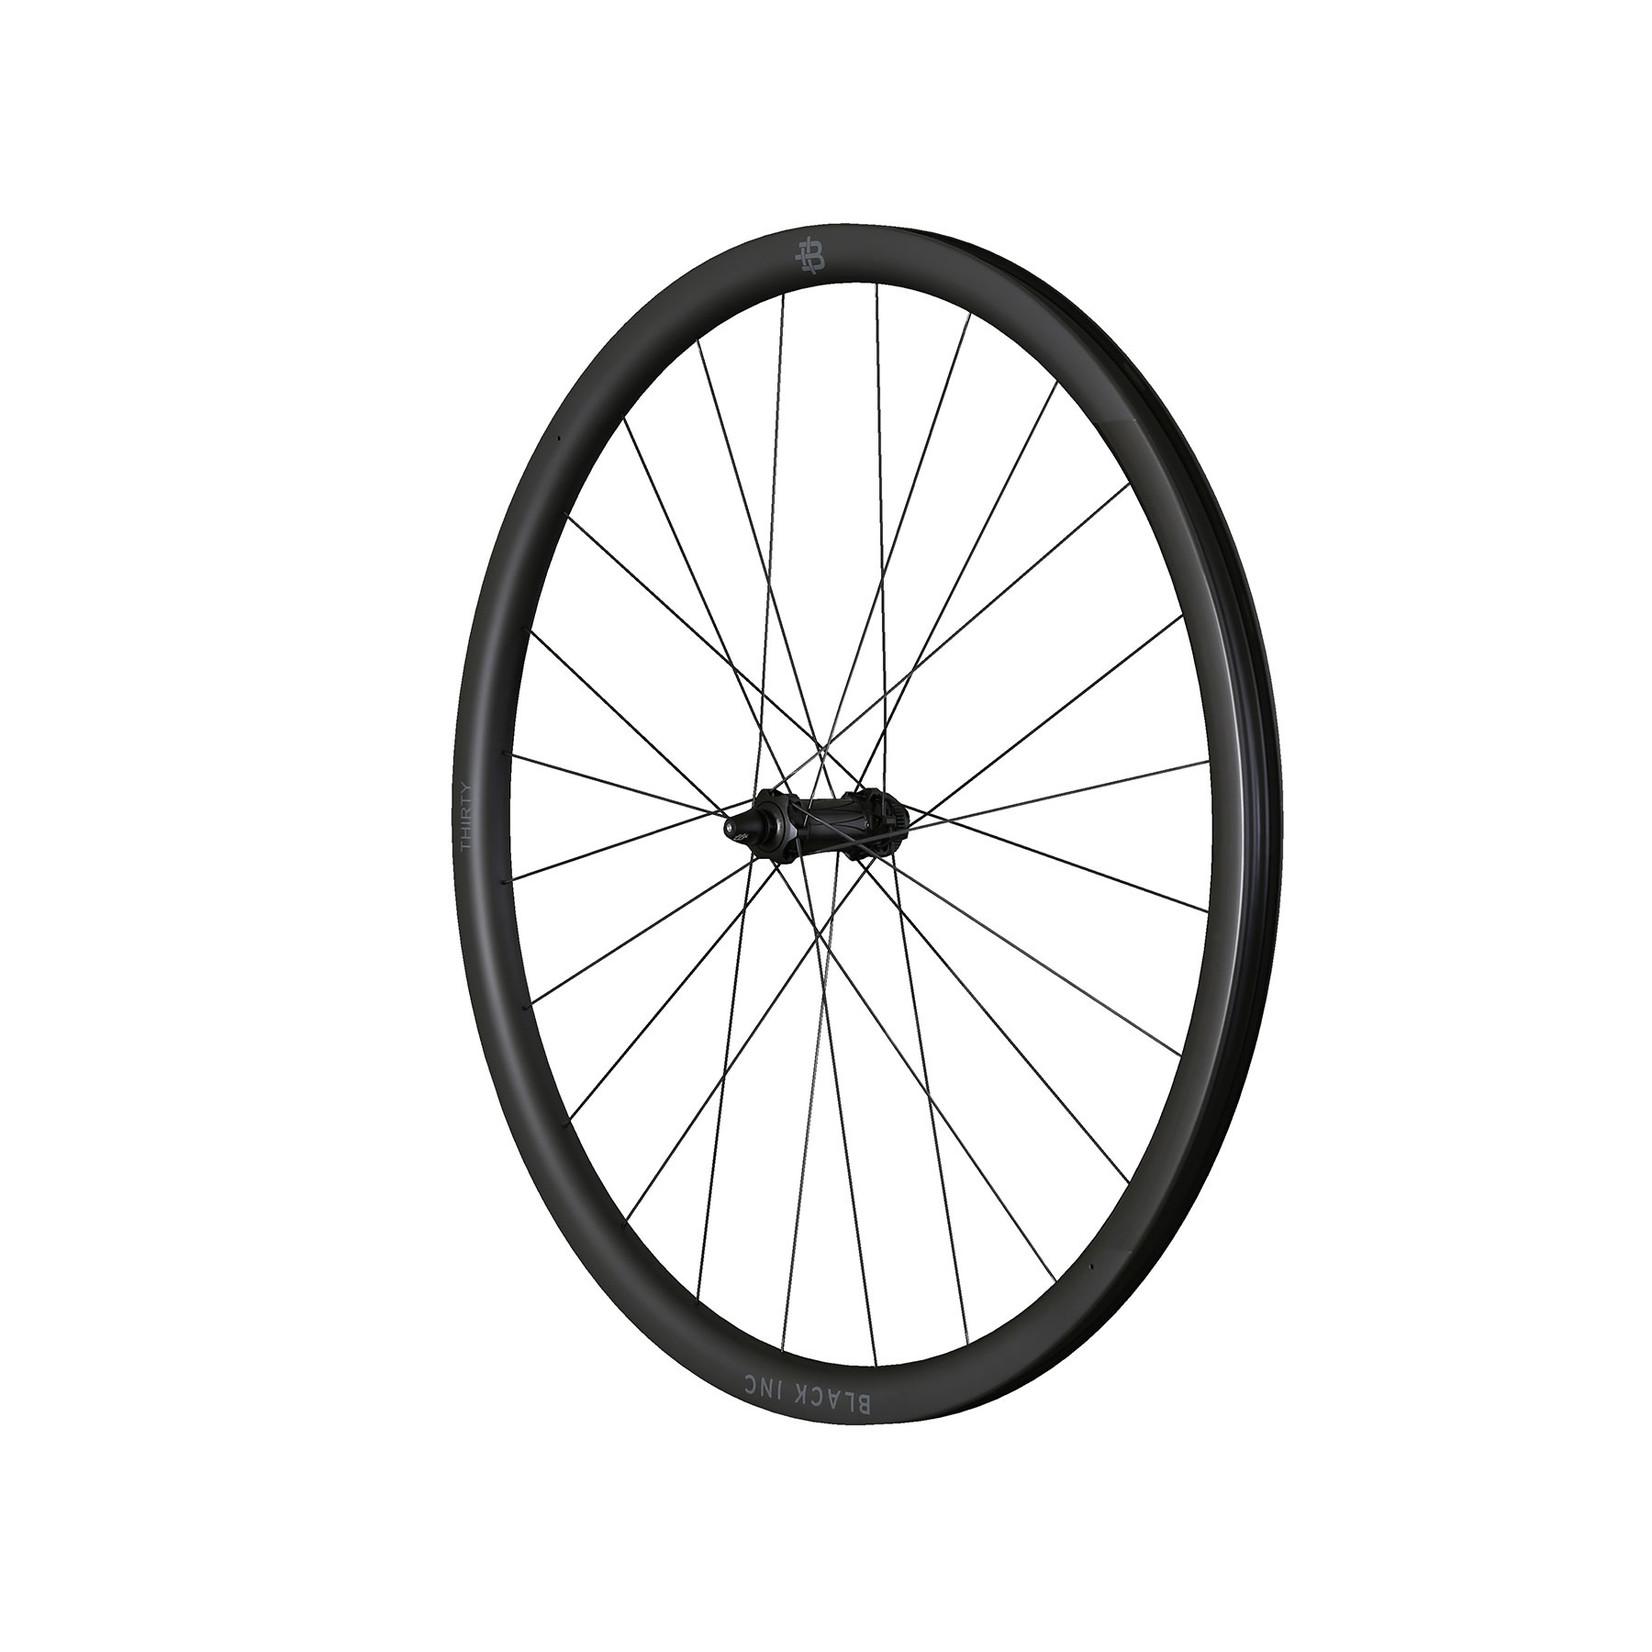 Black Inc Black Inc THIRTY Wheelset - Disk Brakes - Clincher